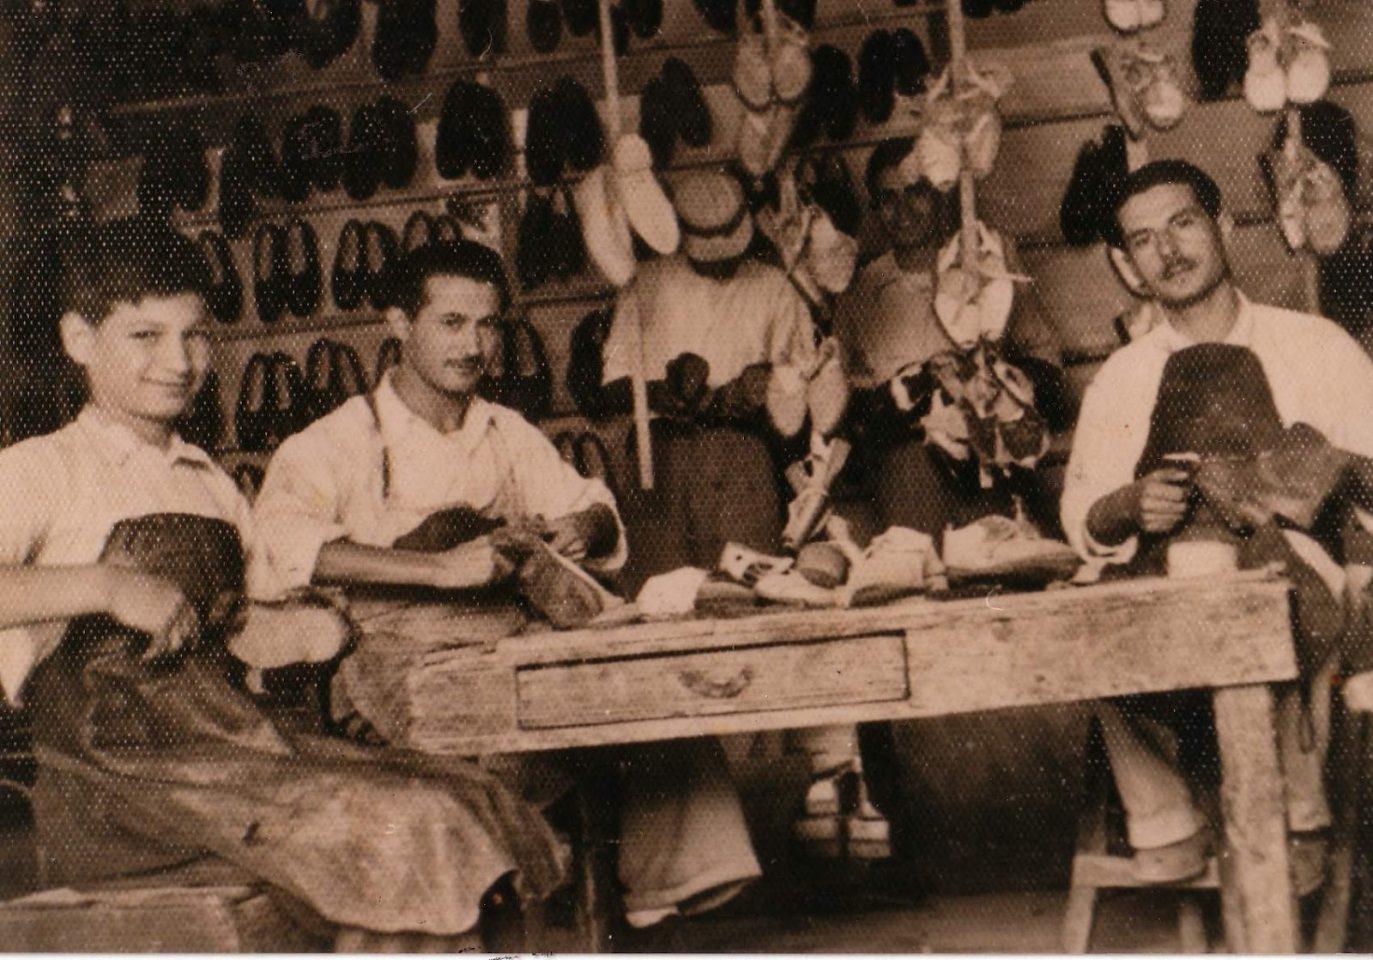 tsagkaris Επαγγέλματα από το ελληνικό παρελθόν που δεν υπάρχουν πια